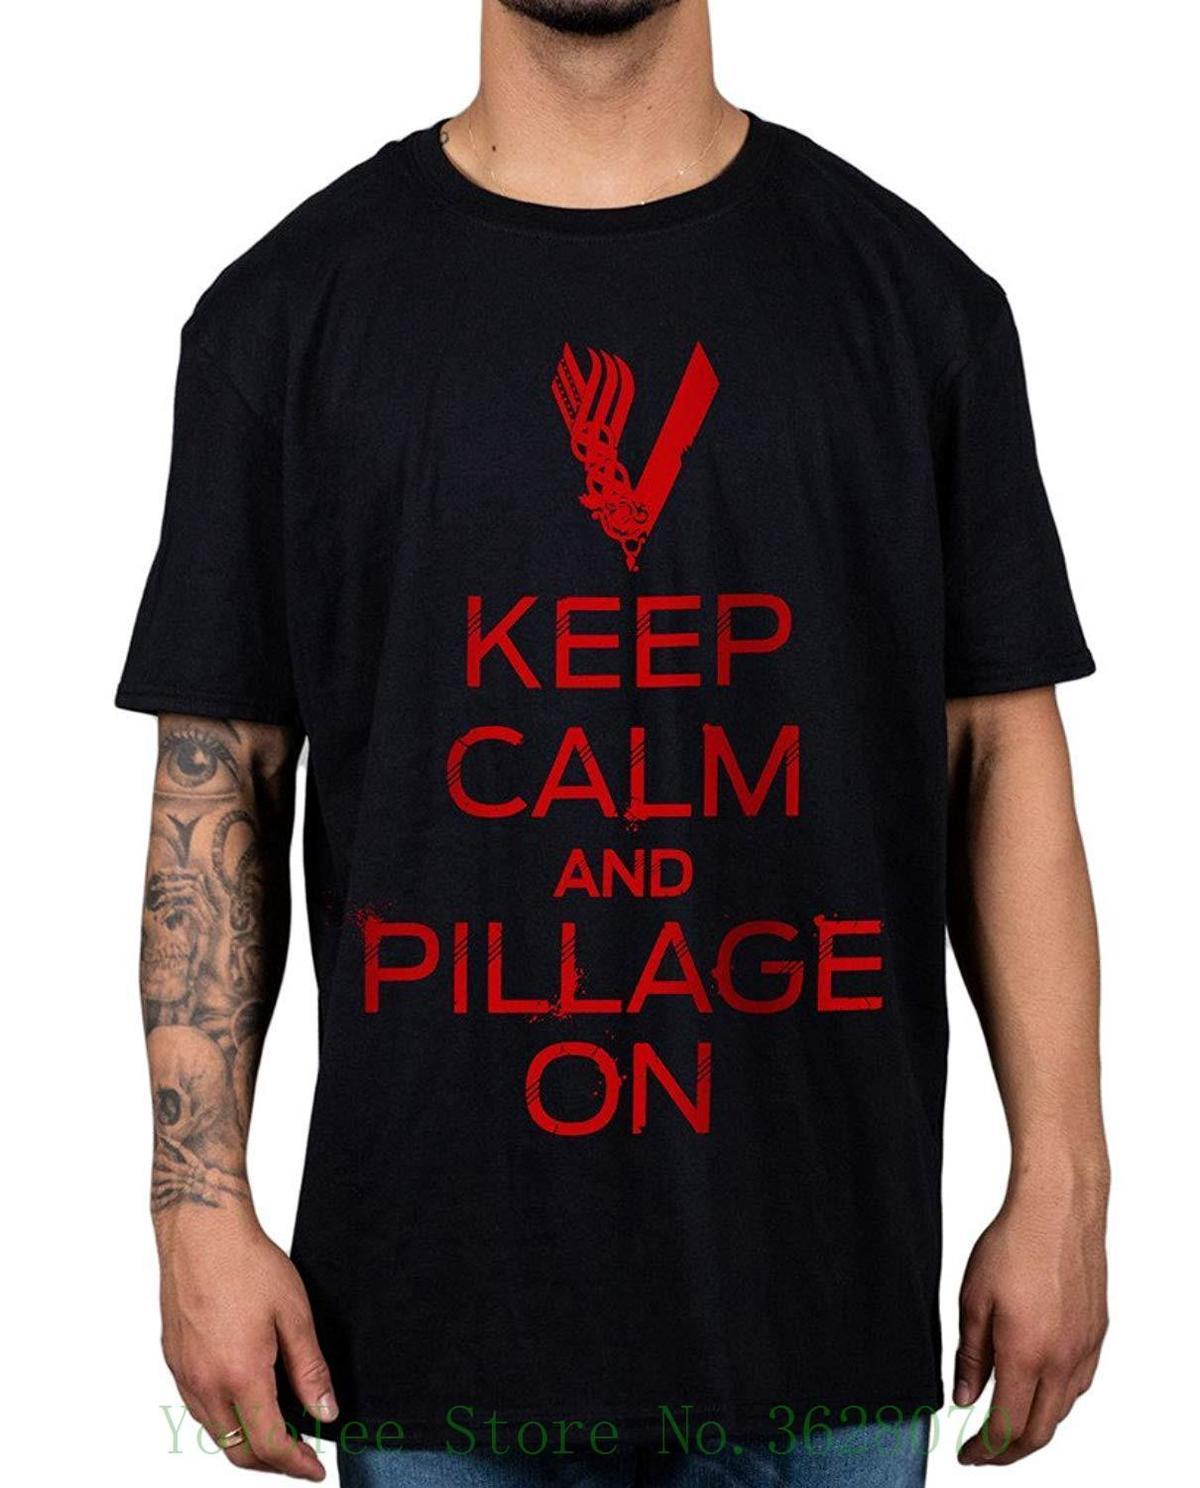 8c71095e Official Vikings Keep Calm And Pillage On Unisex T-shirt Ragnar Floki Short  Sleeve Round Neck T Shirt Promotion